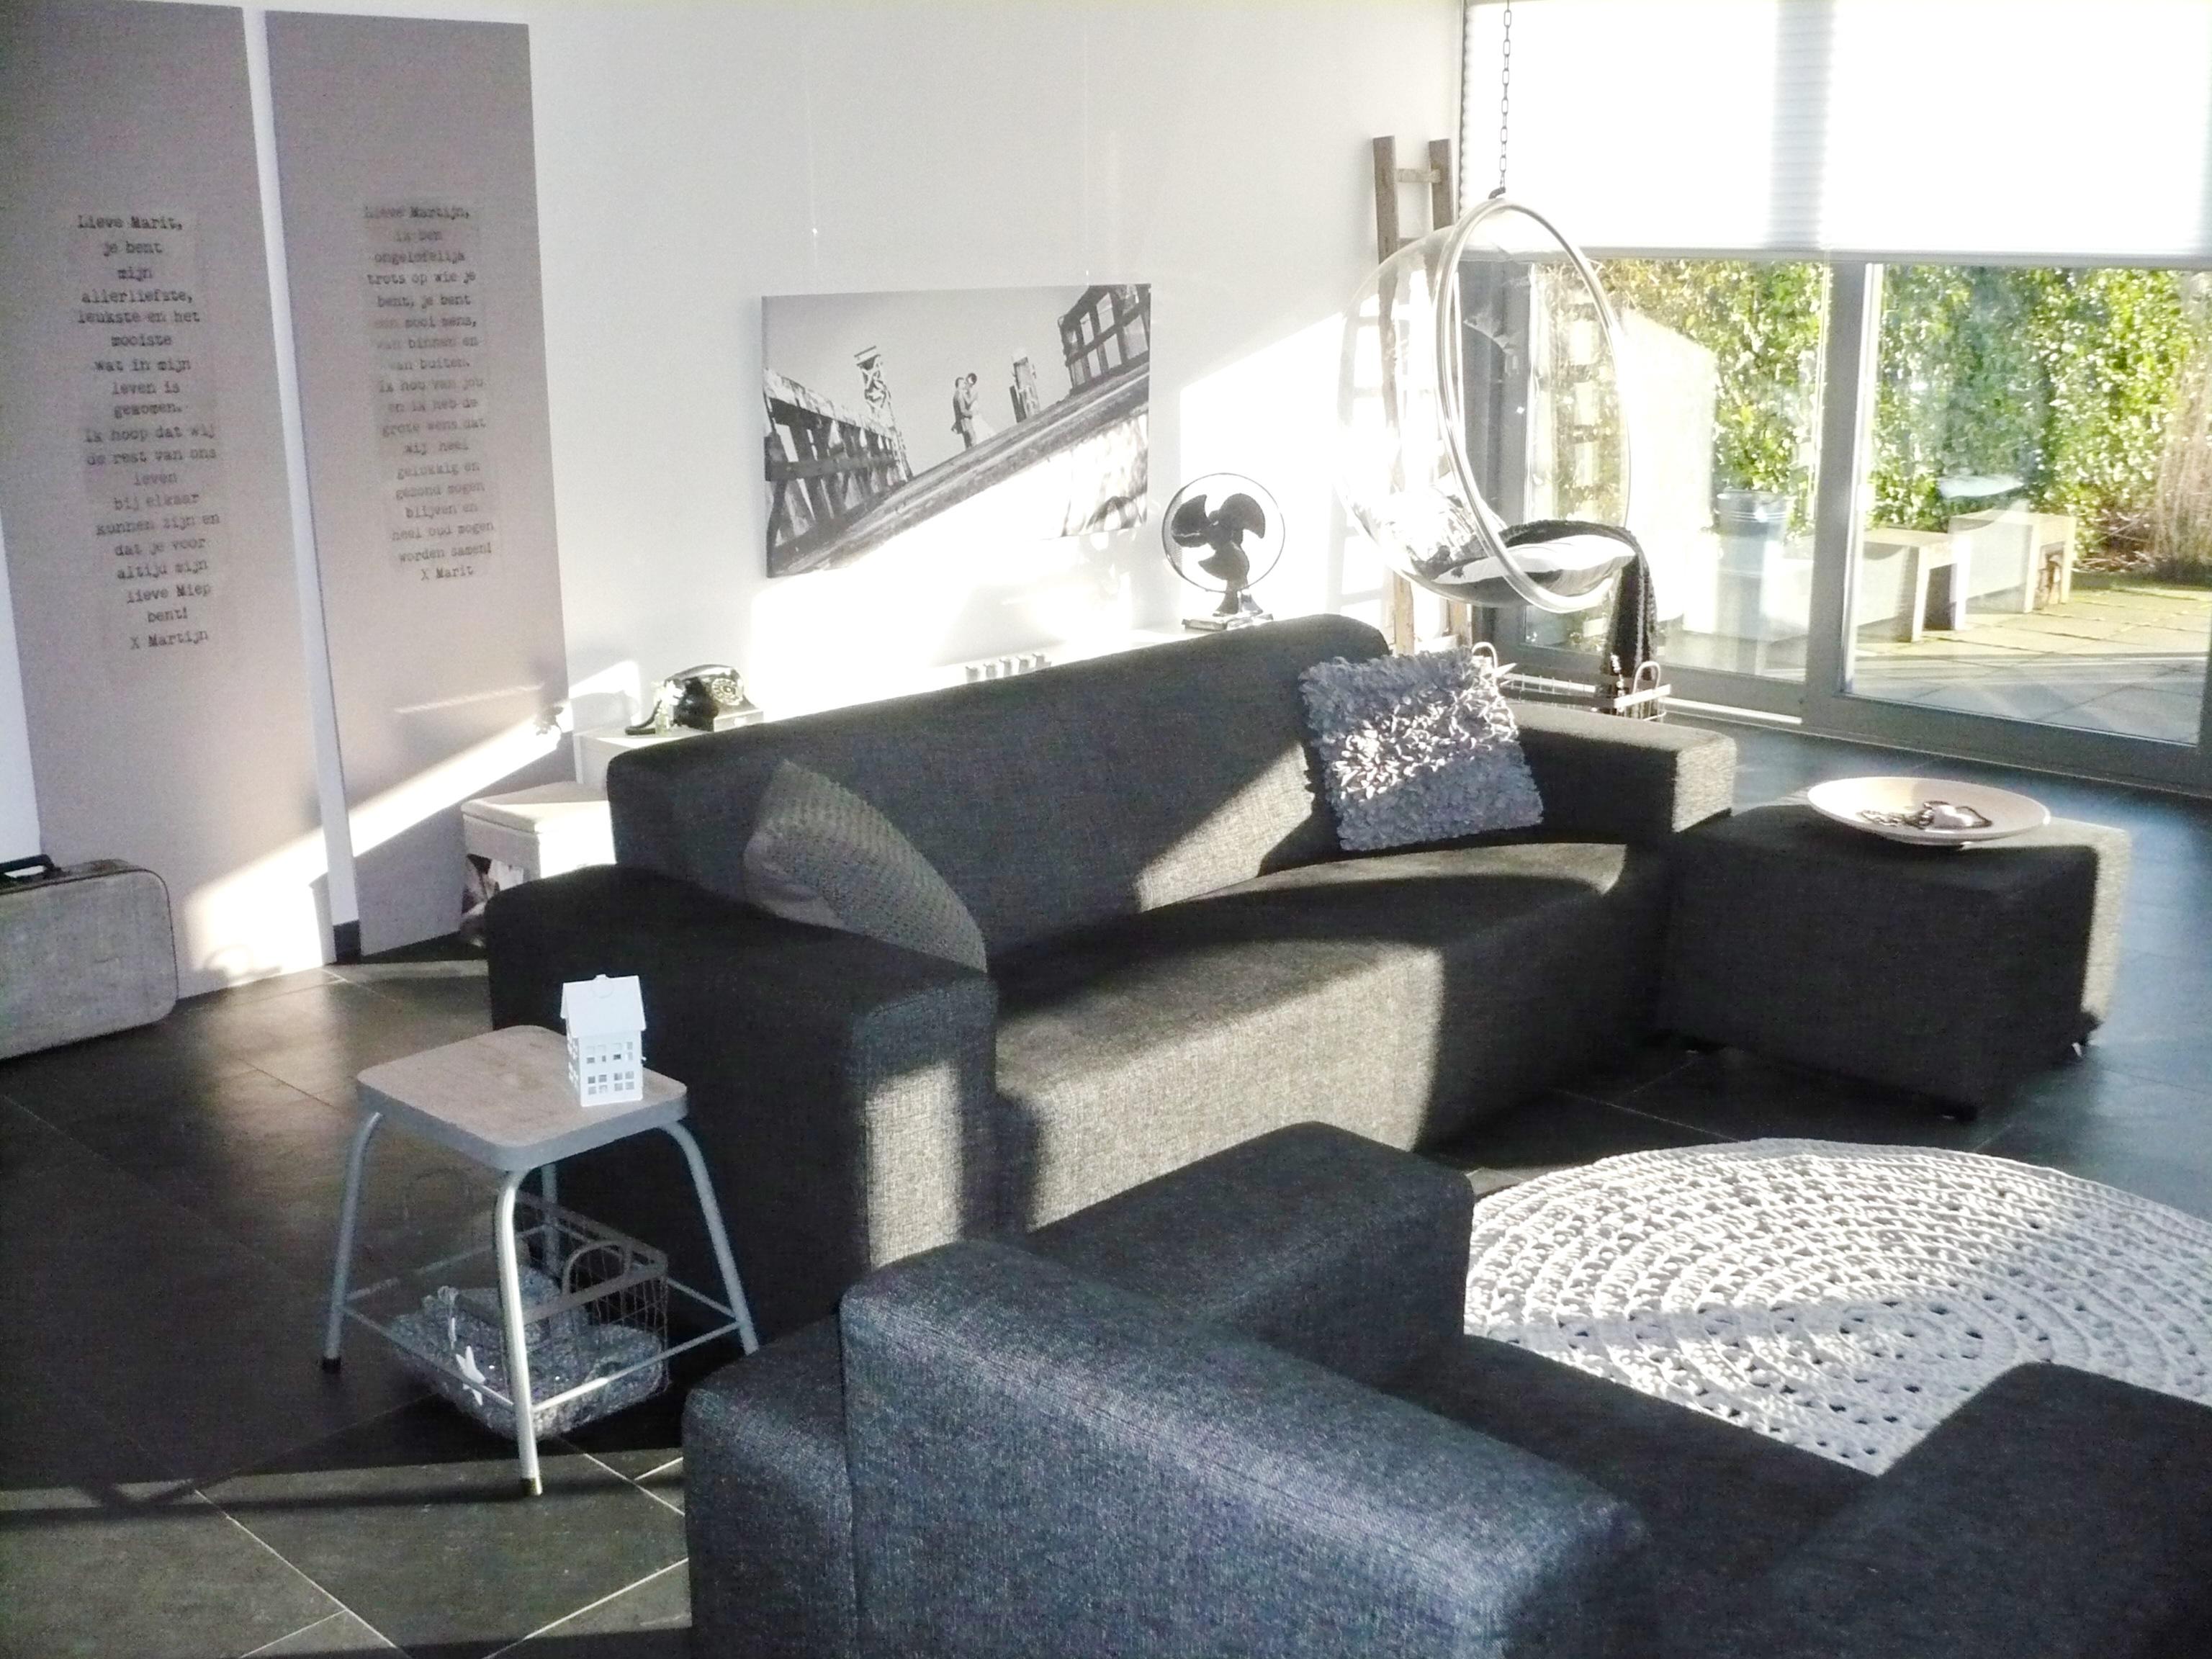 Interieur Ideeen Woonkamer Grijs: Valse wand in woonkamer materiaal ...